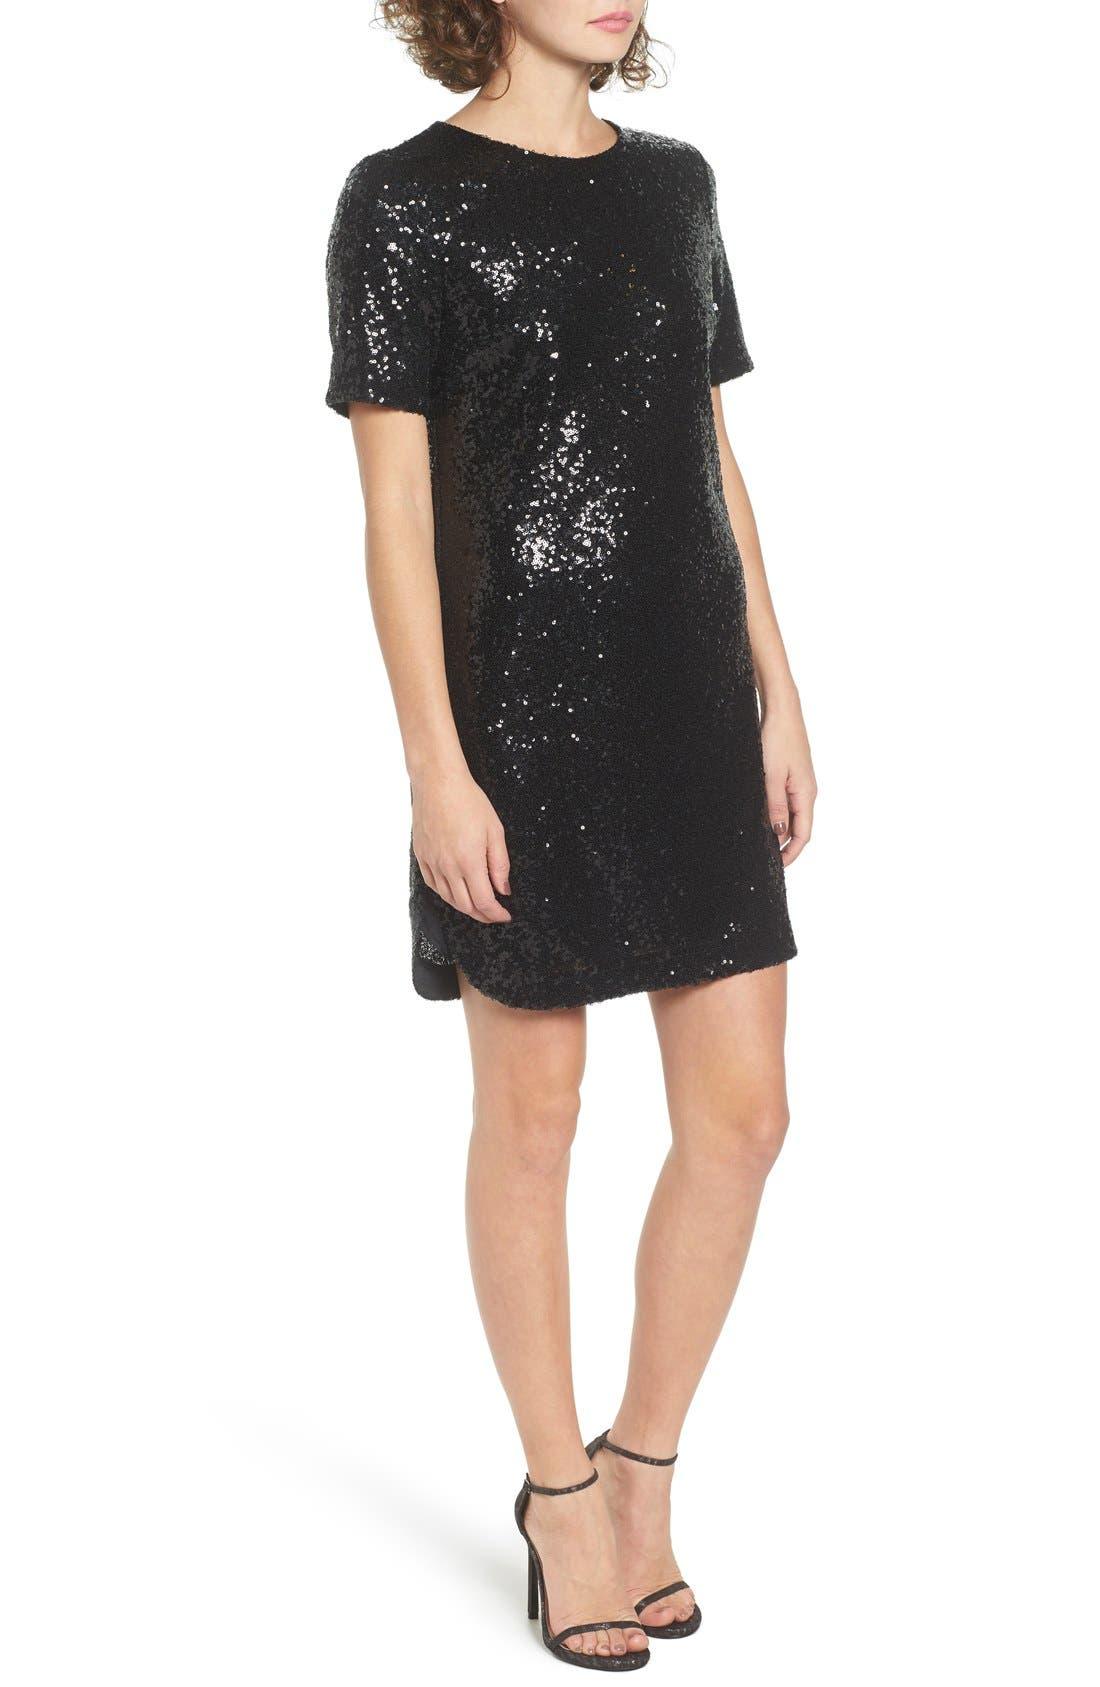 SOPRANO, Sequin T-Shirt Dress, Alternate thumbnail 3, color, 001